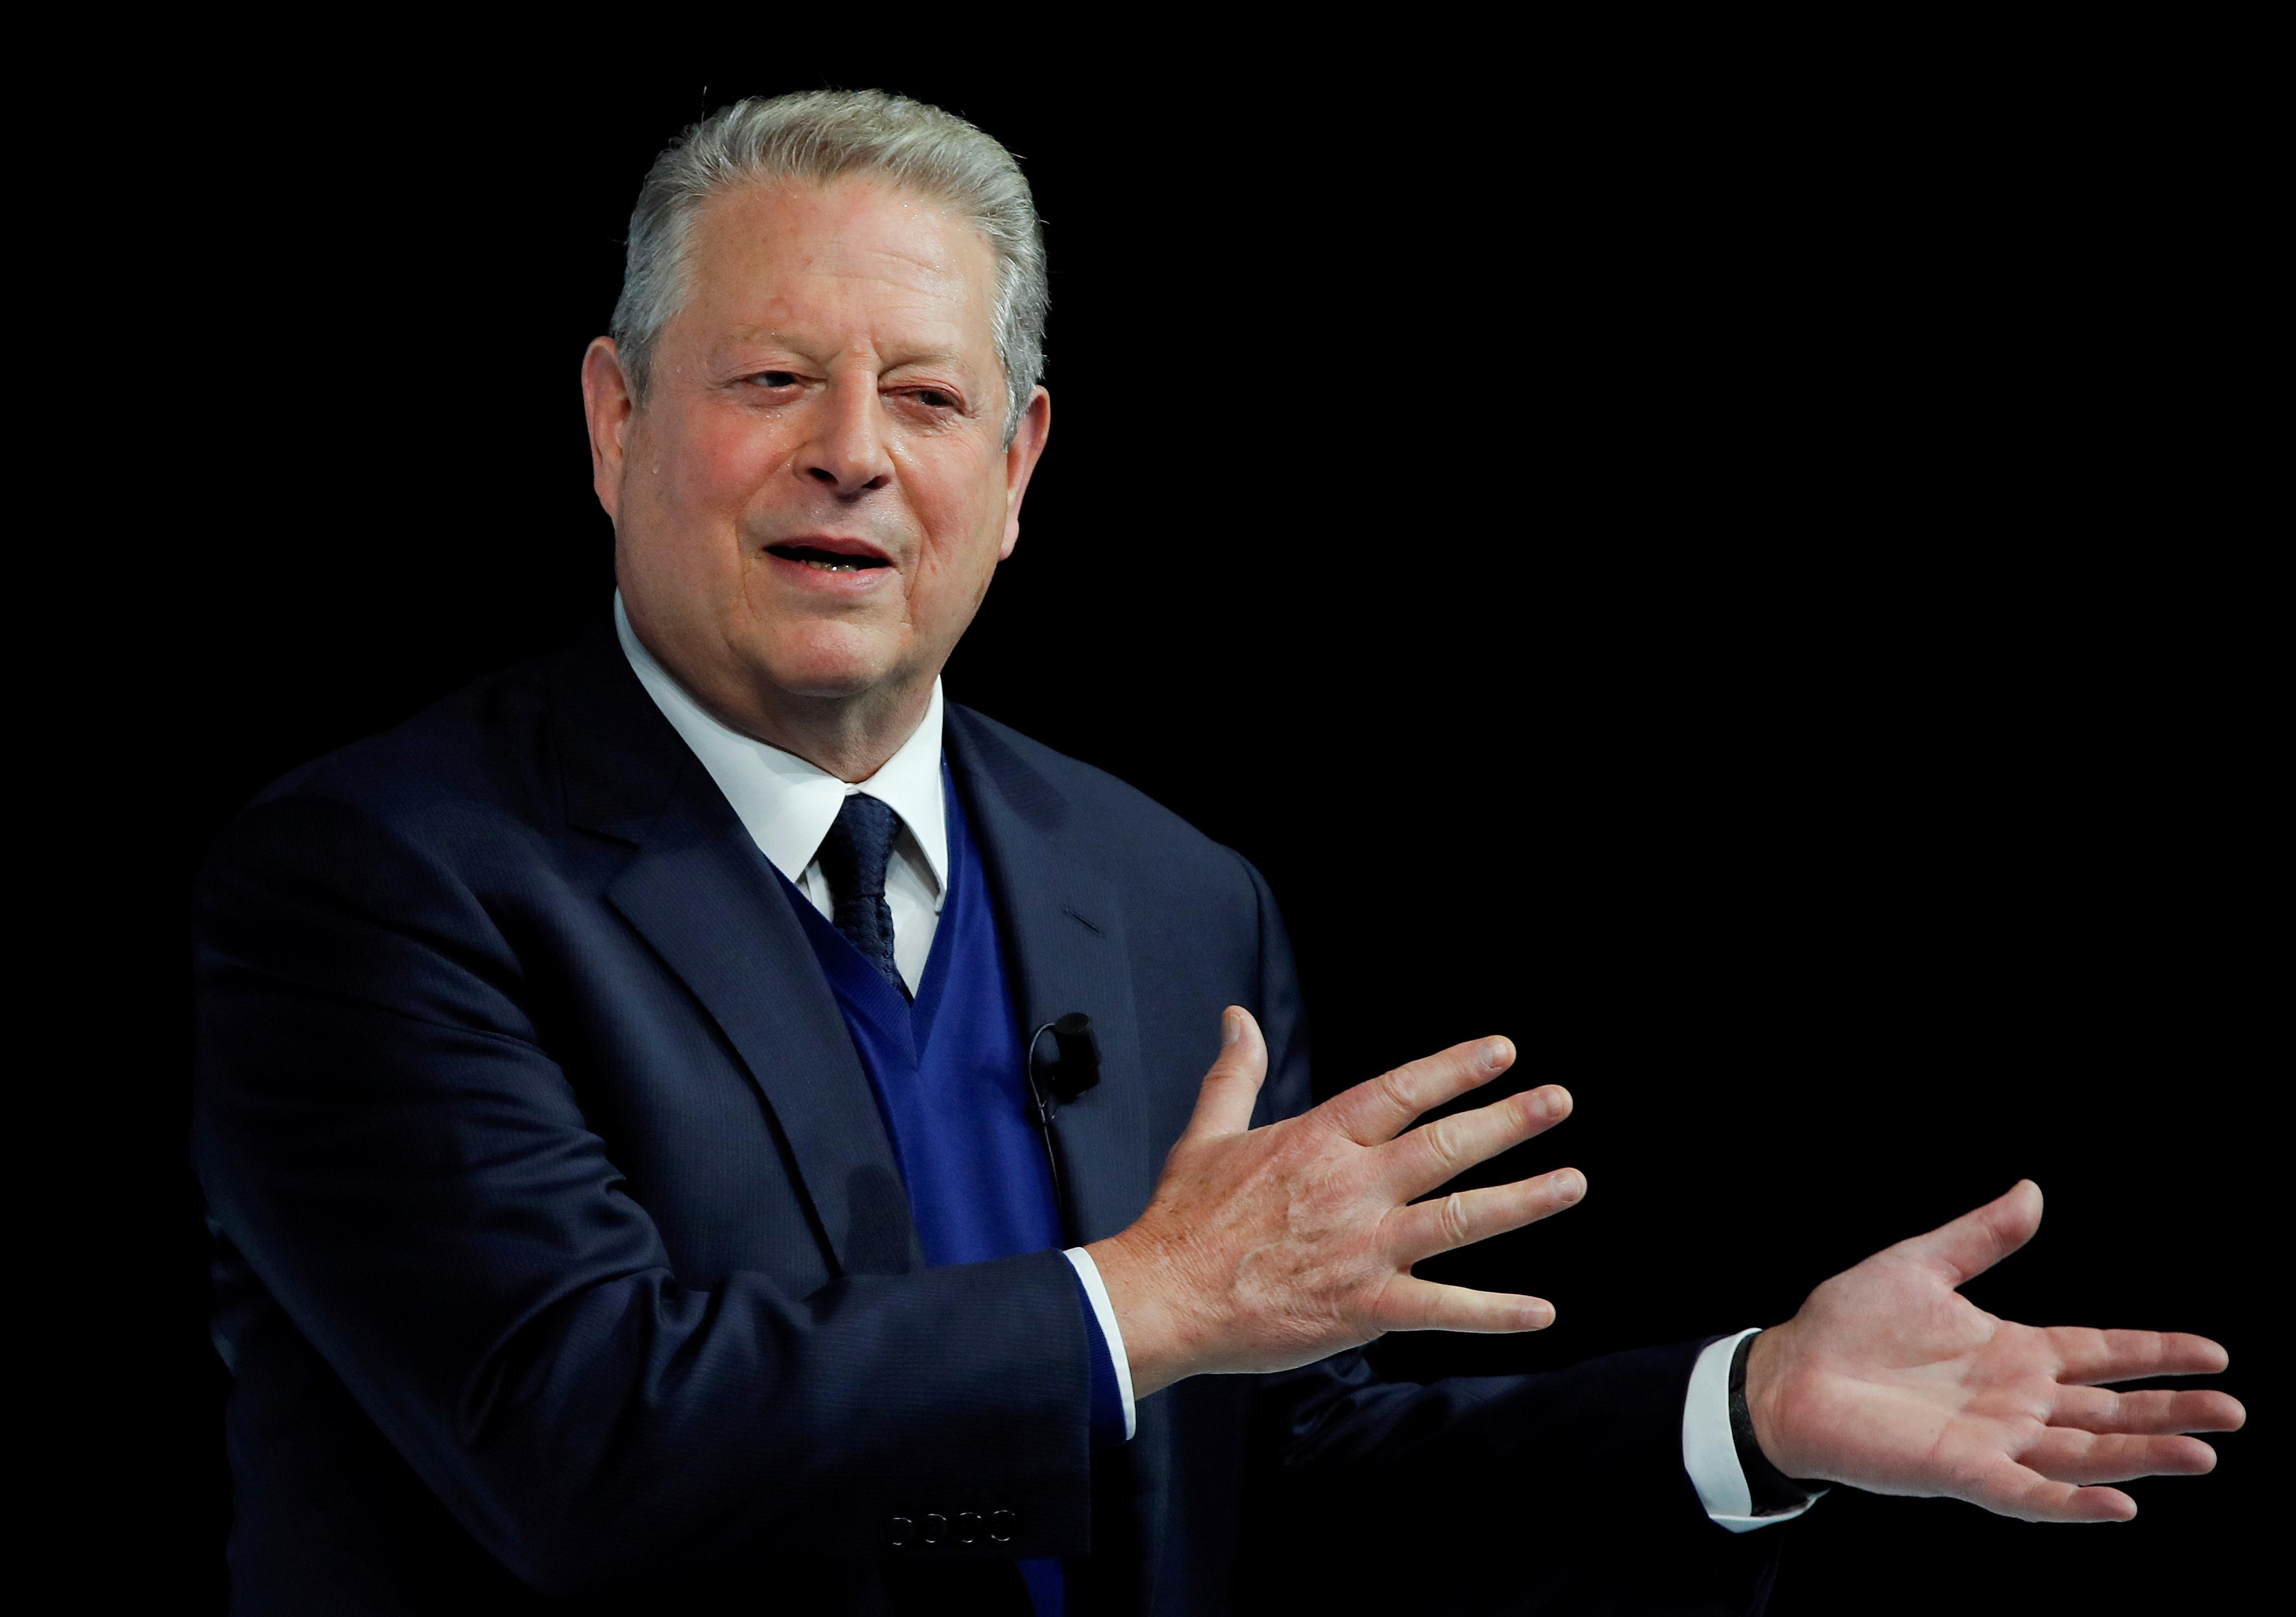 Al Gore's Generation raises $1 billion for latest private equity fund